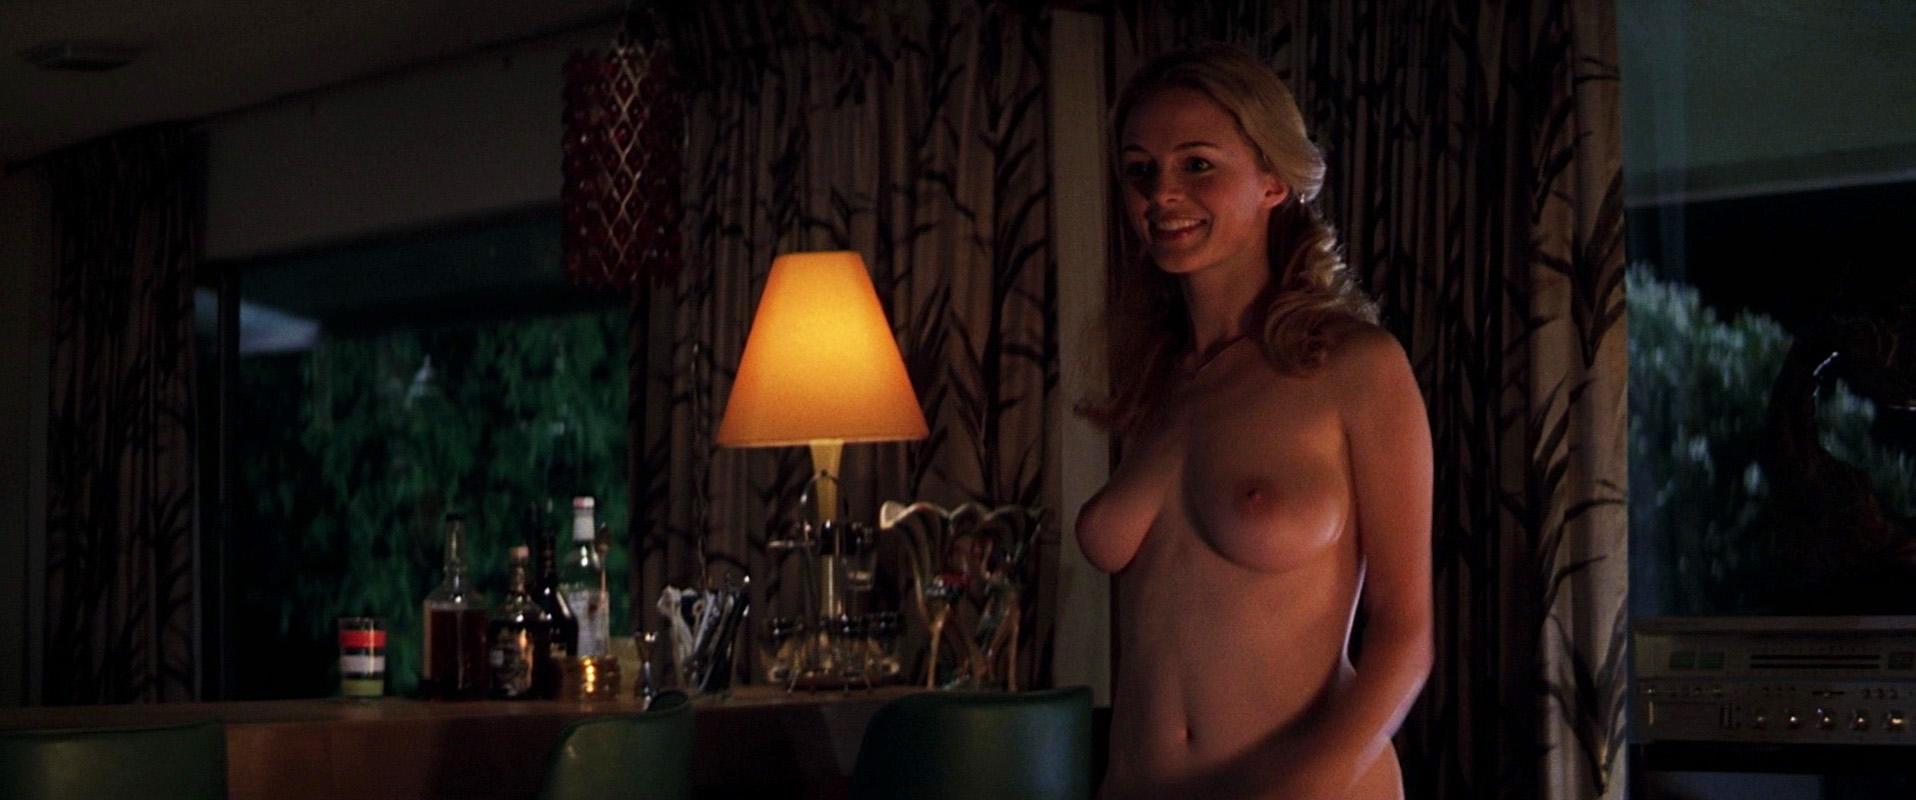 Sexy triple penetration gif